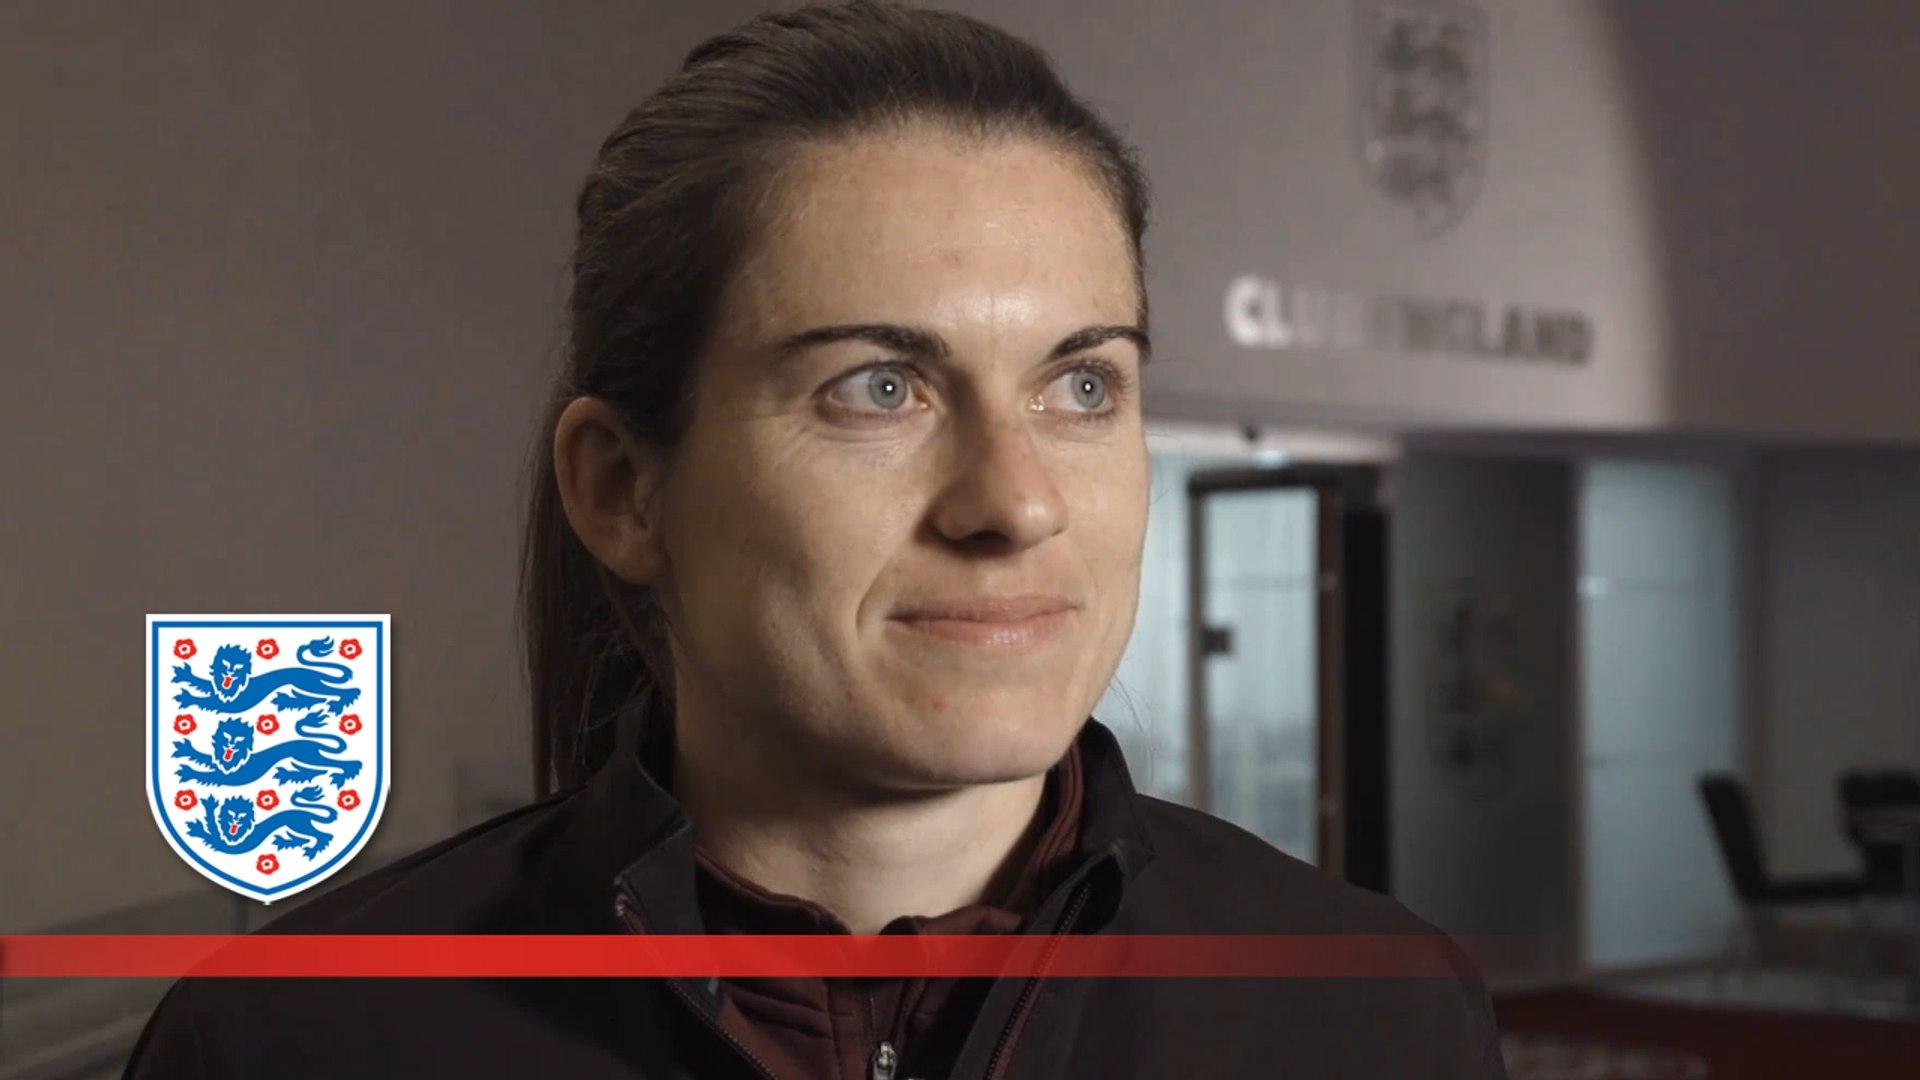 Karen Carney on playing attacking football | FATV Meets